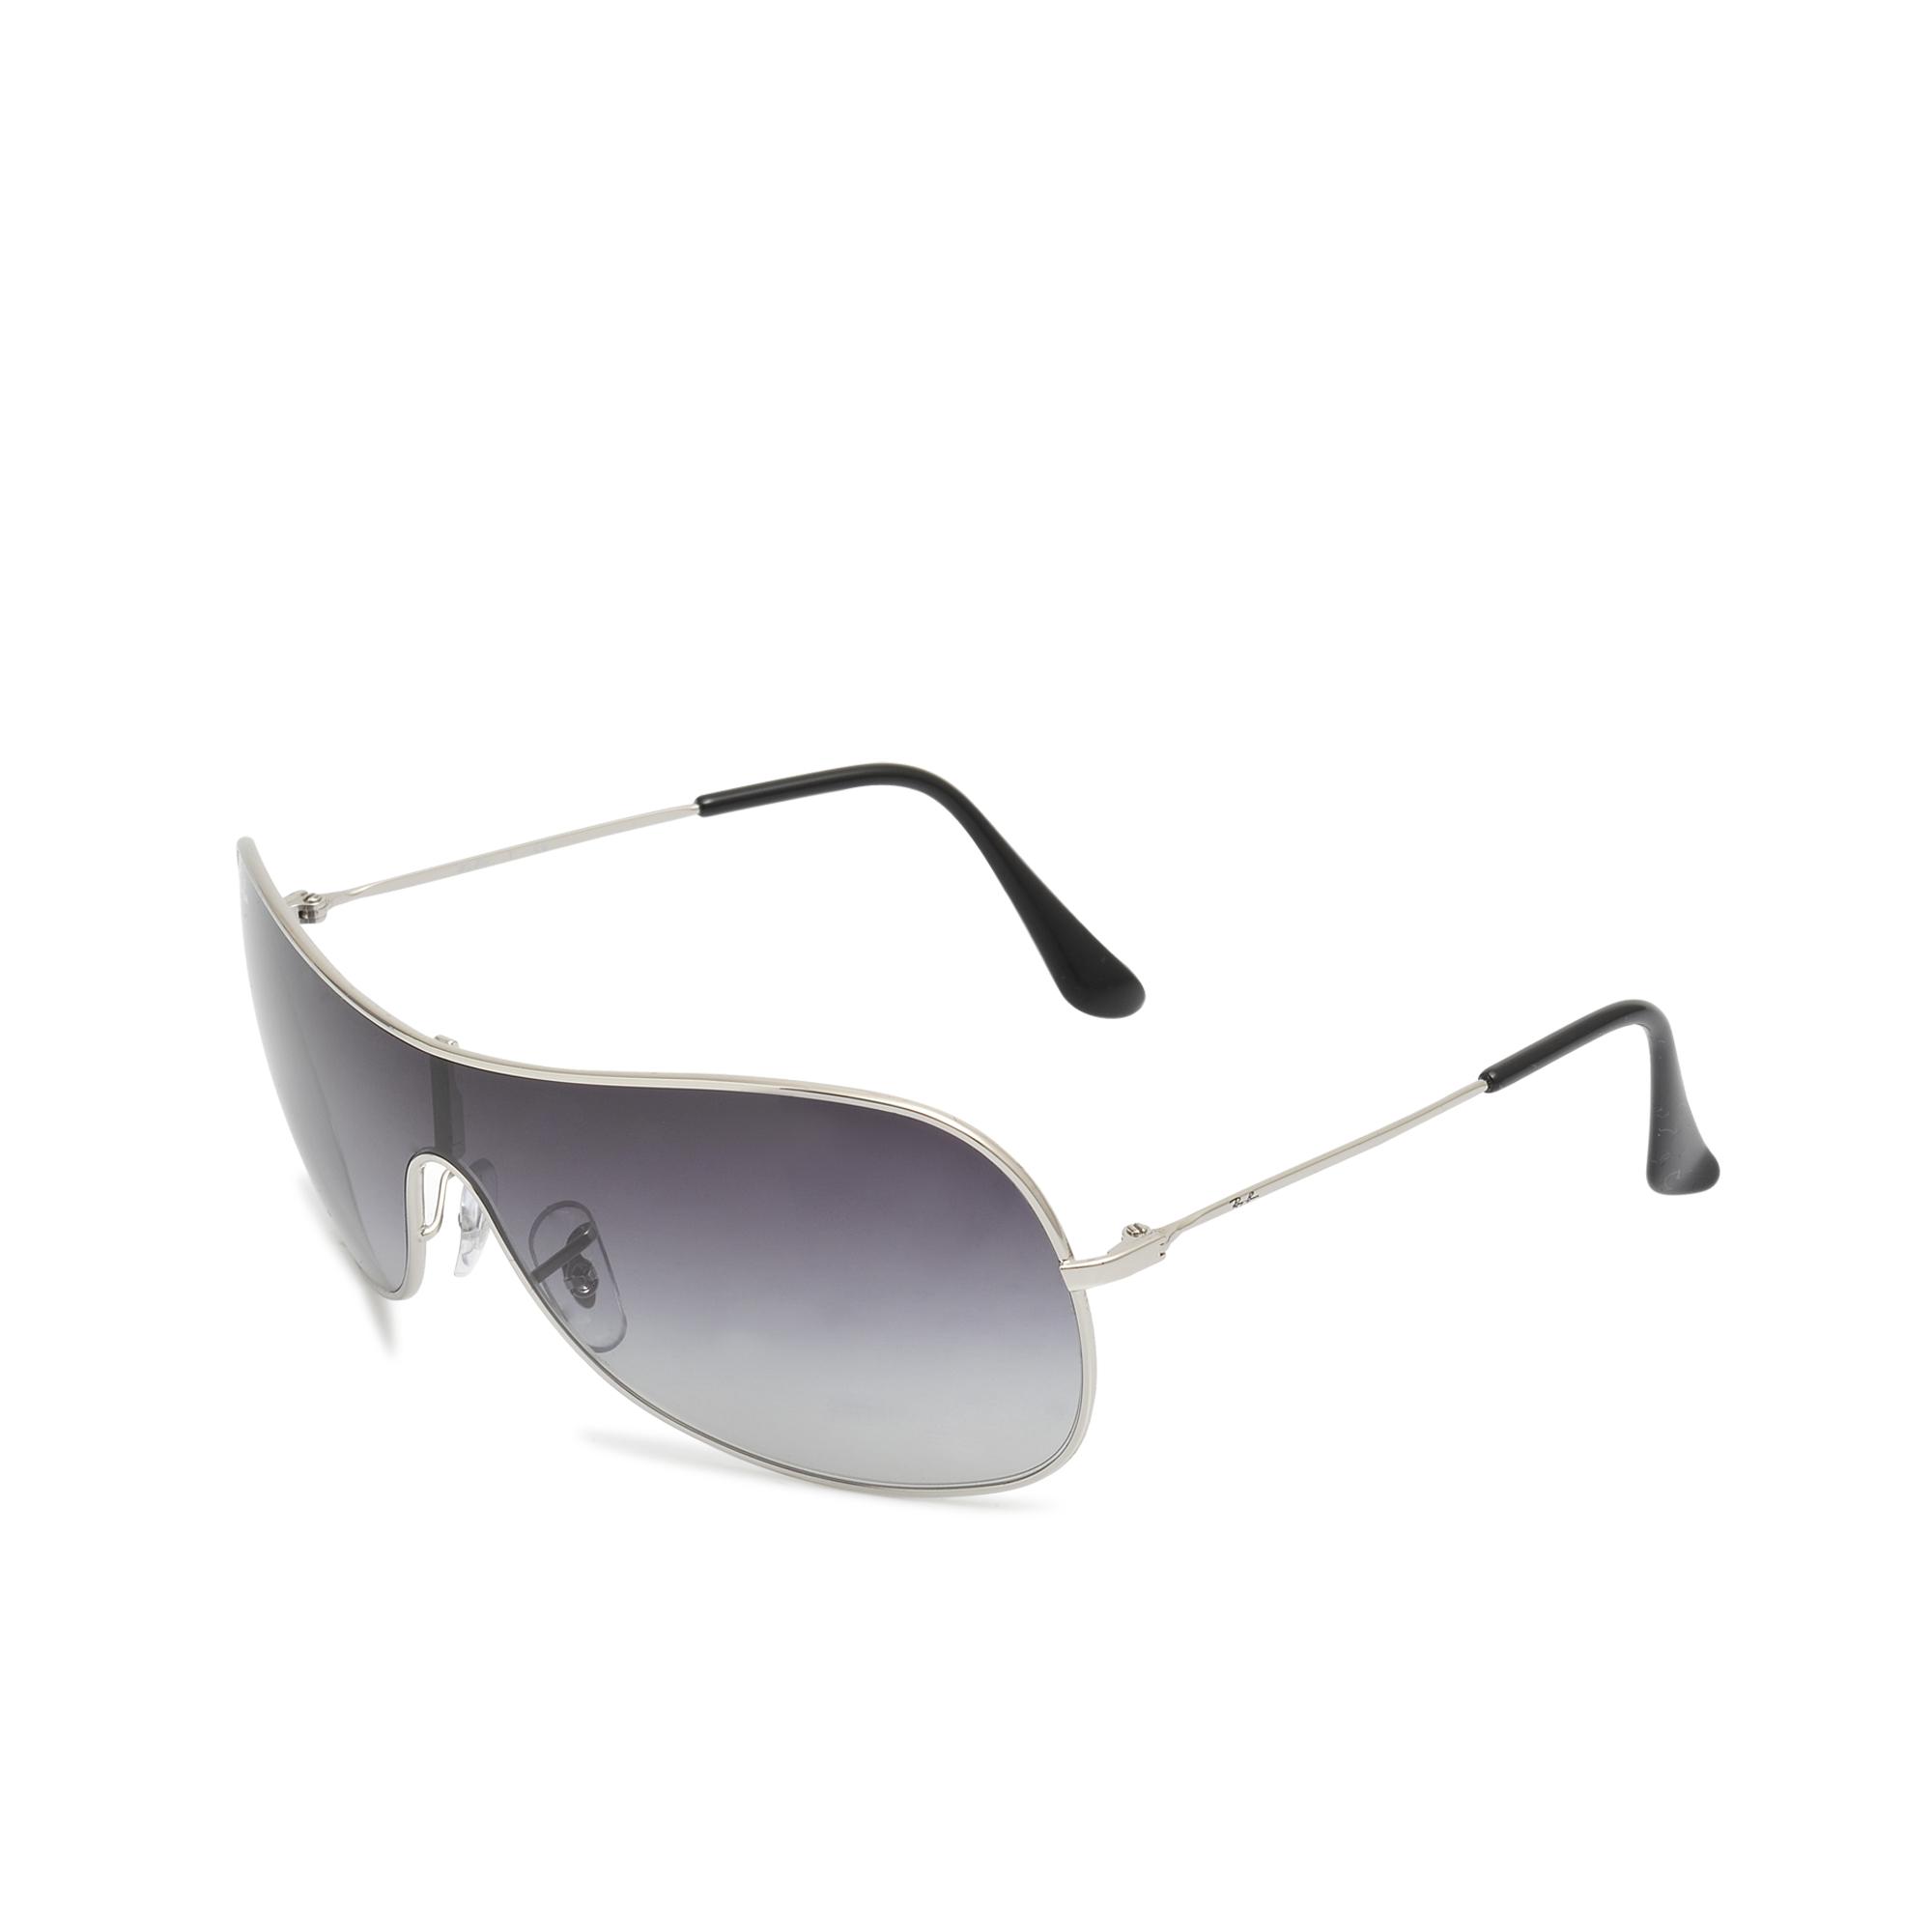 Ray-Ban Mask Sunglasses in Silver (Metallic)